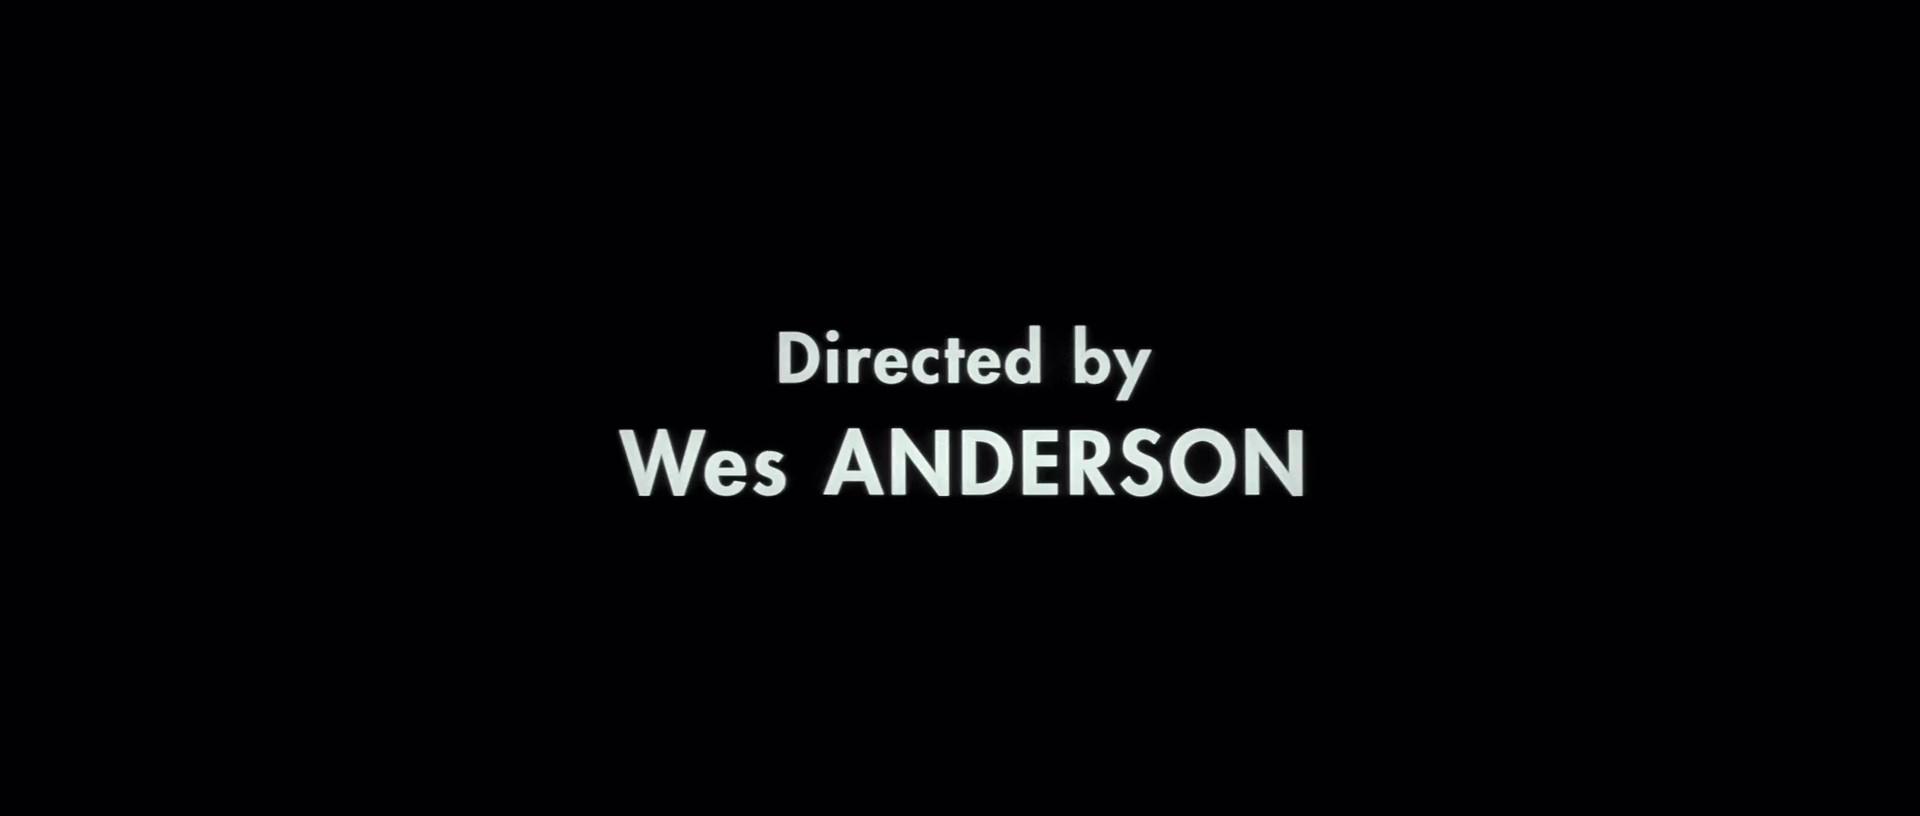 Academia Rushmore (1998) BDrip Dual x IndioLoko66(CineClubClasico)_Moment19.jpg